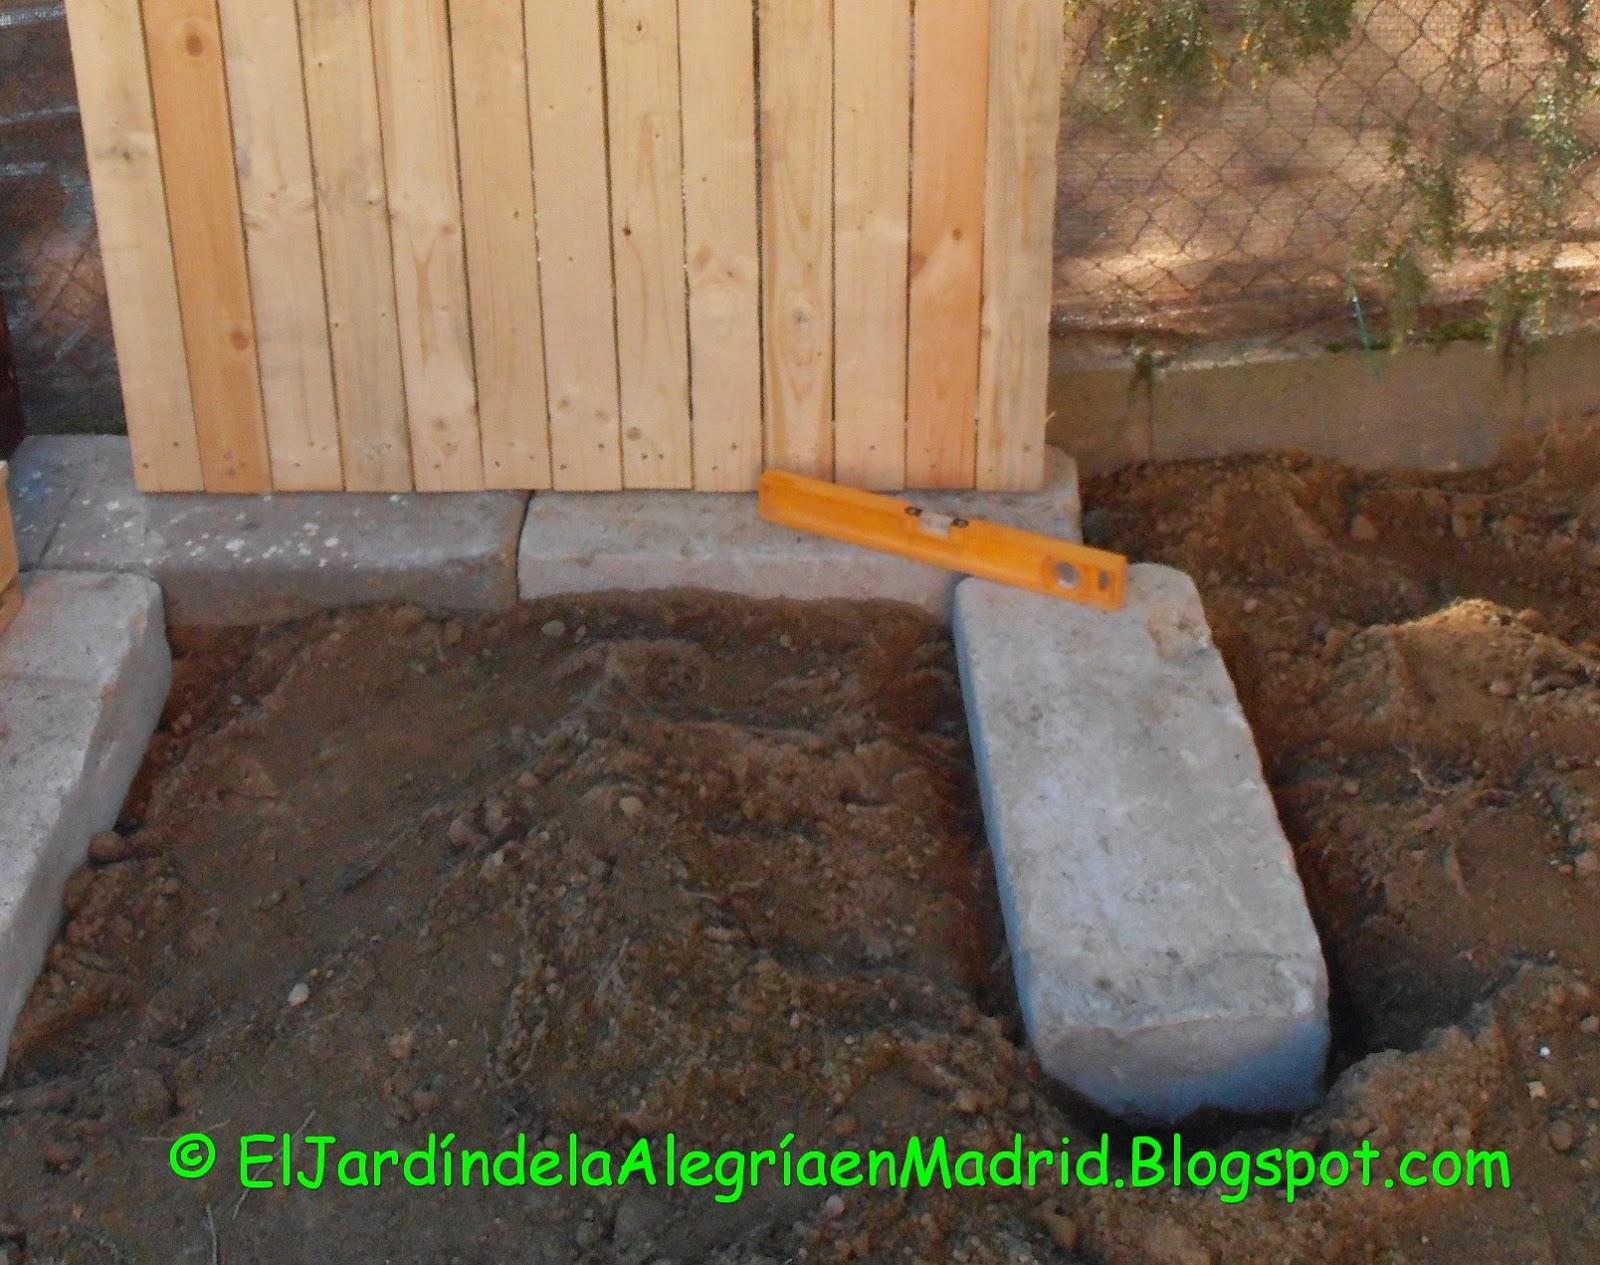 El jard n de la alegr a 01 06 15 for Cerrar valla jardin